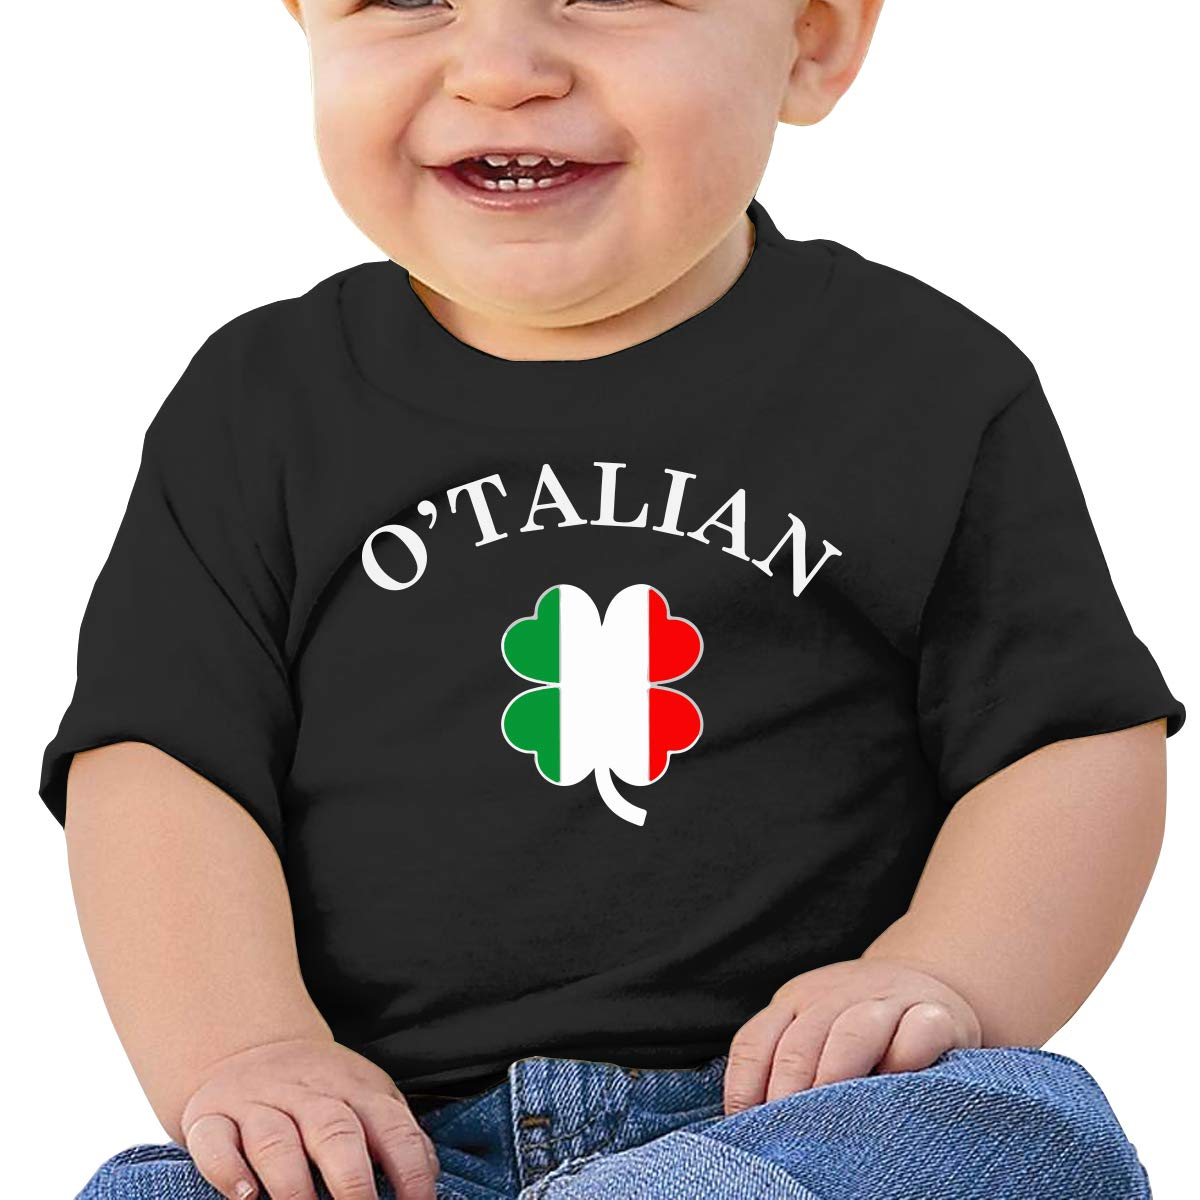 ANYE/&/&HF OTalian Italian Irish Shamrock Baby Girls T-Shirts